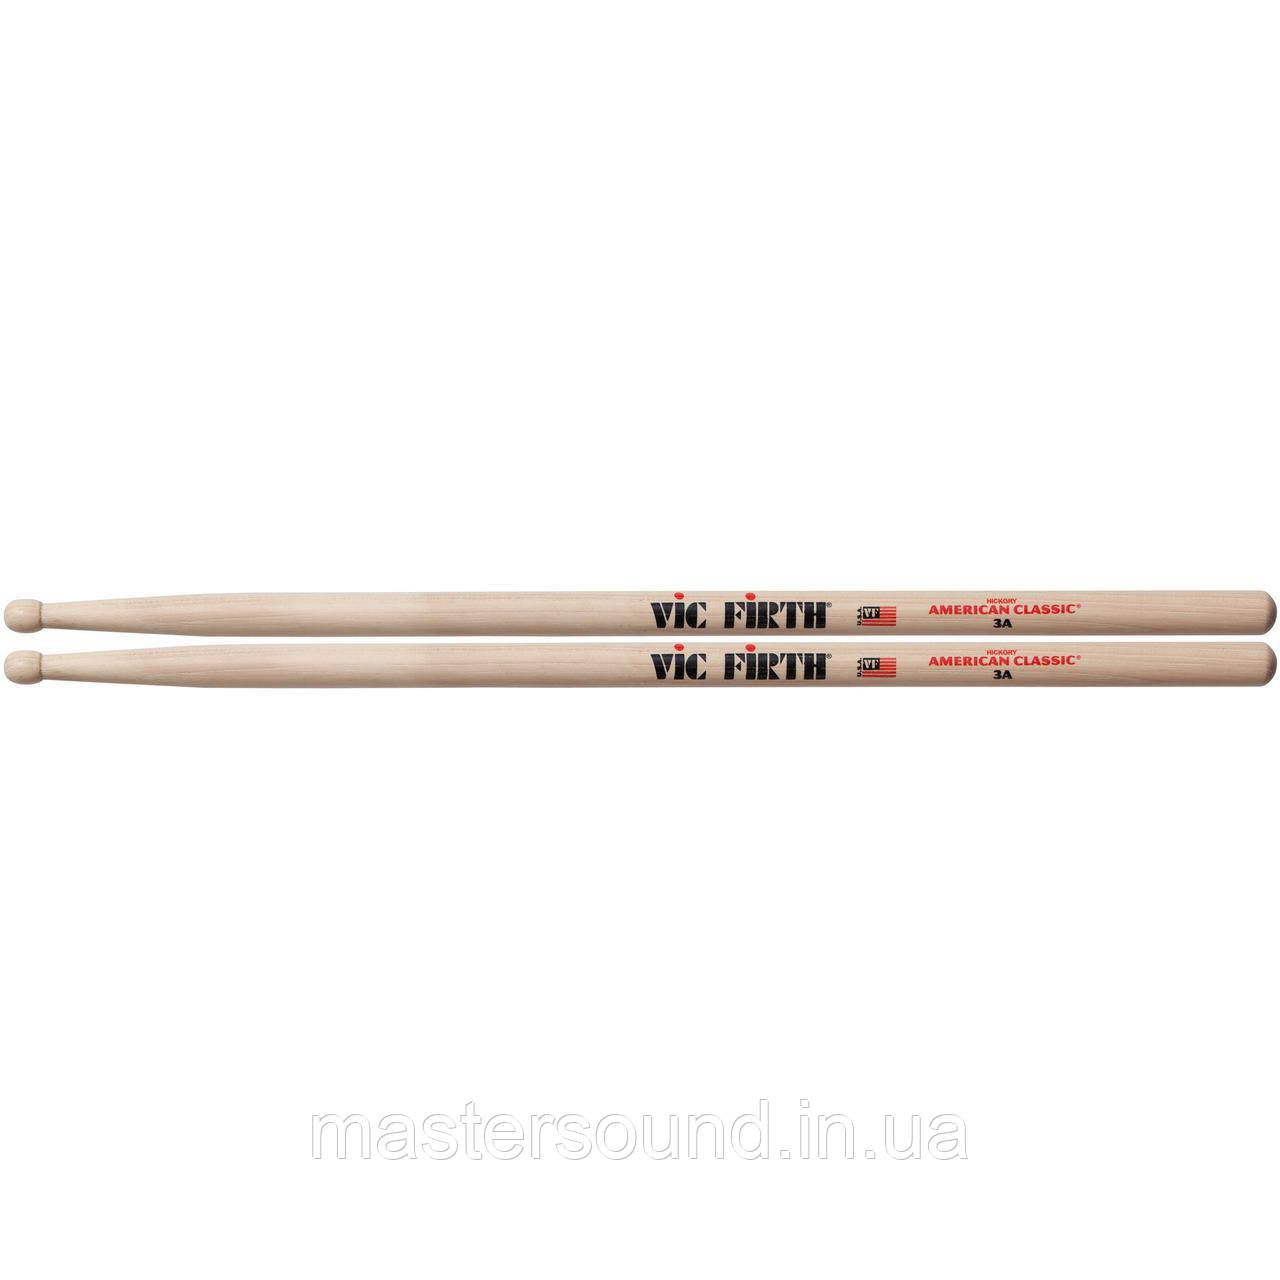 Барабанные палочки Vic Firth 3A